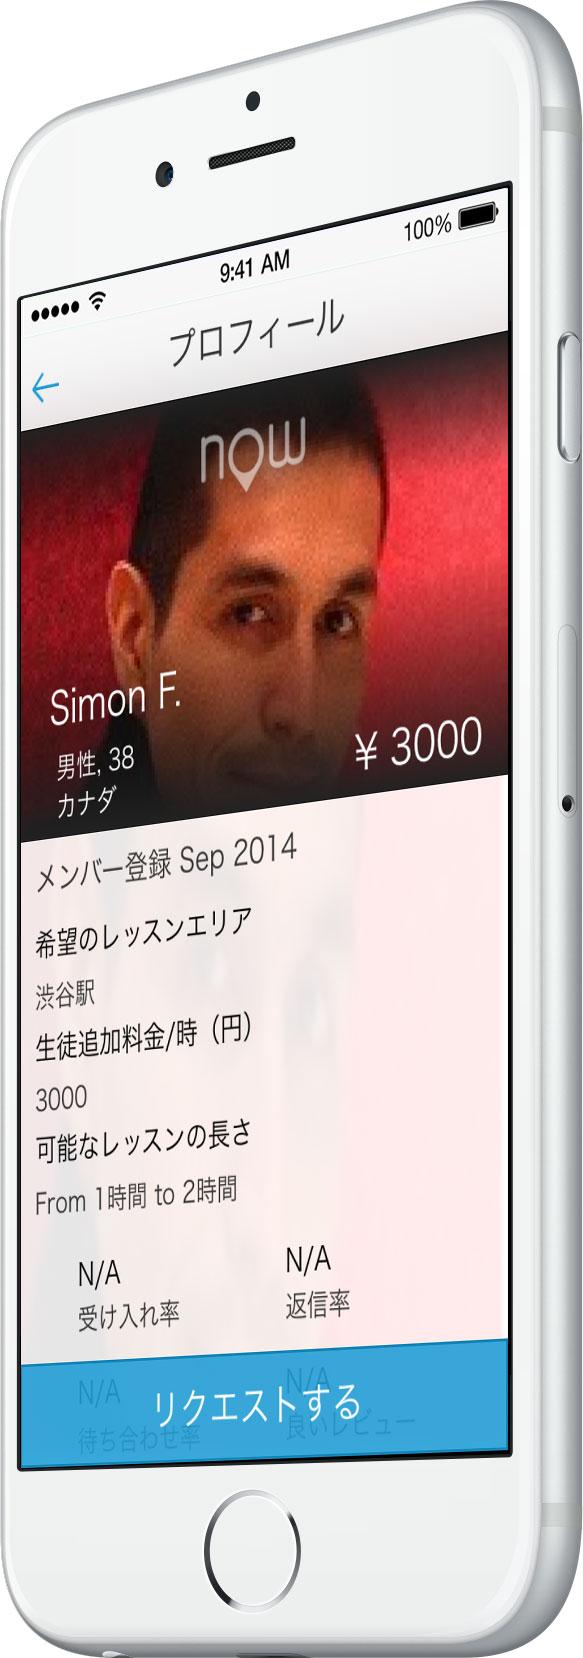 teacher_Simon.jpg